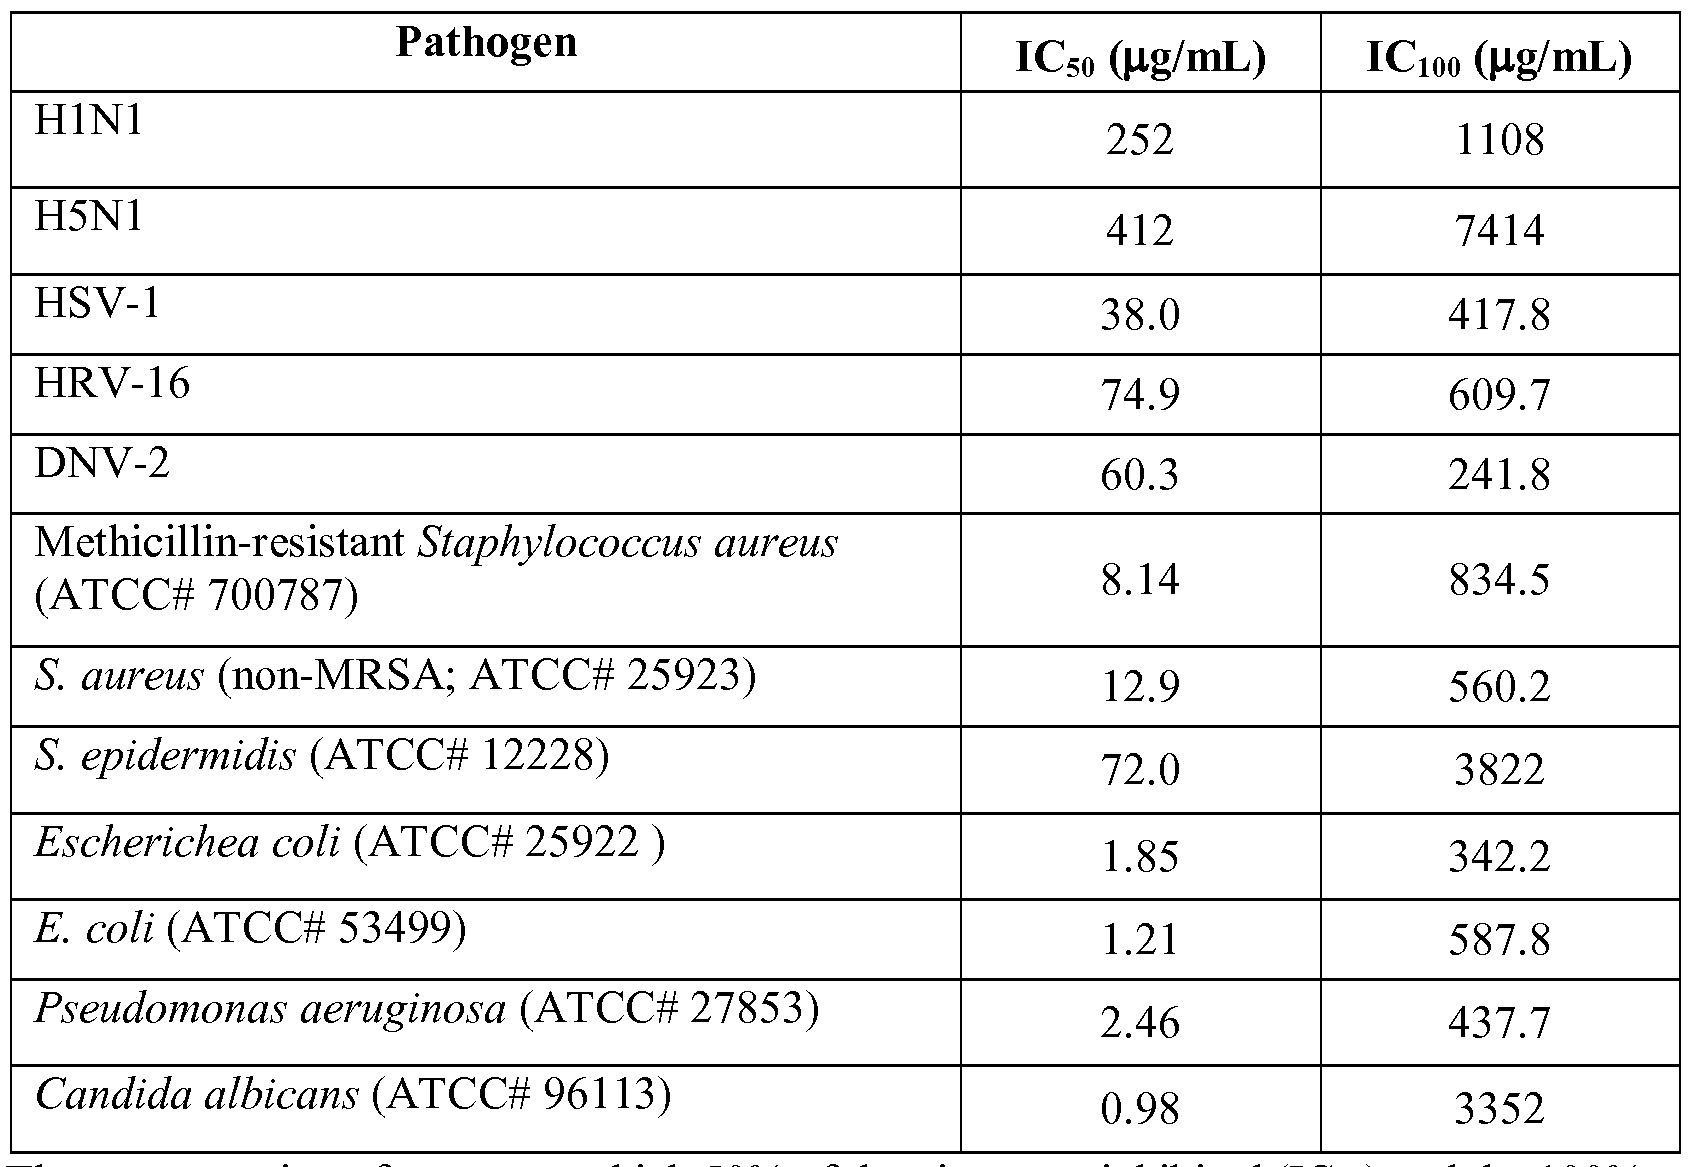 Inosine pranobex fdating